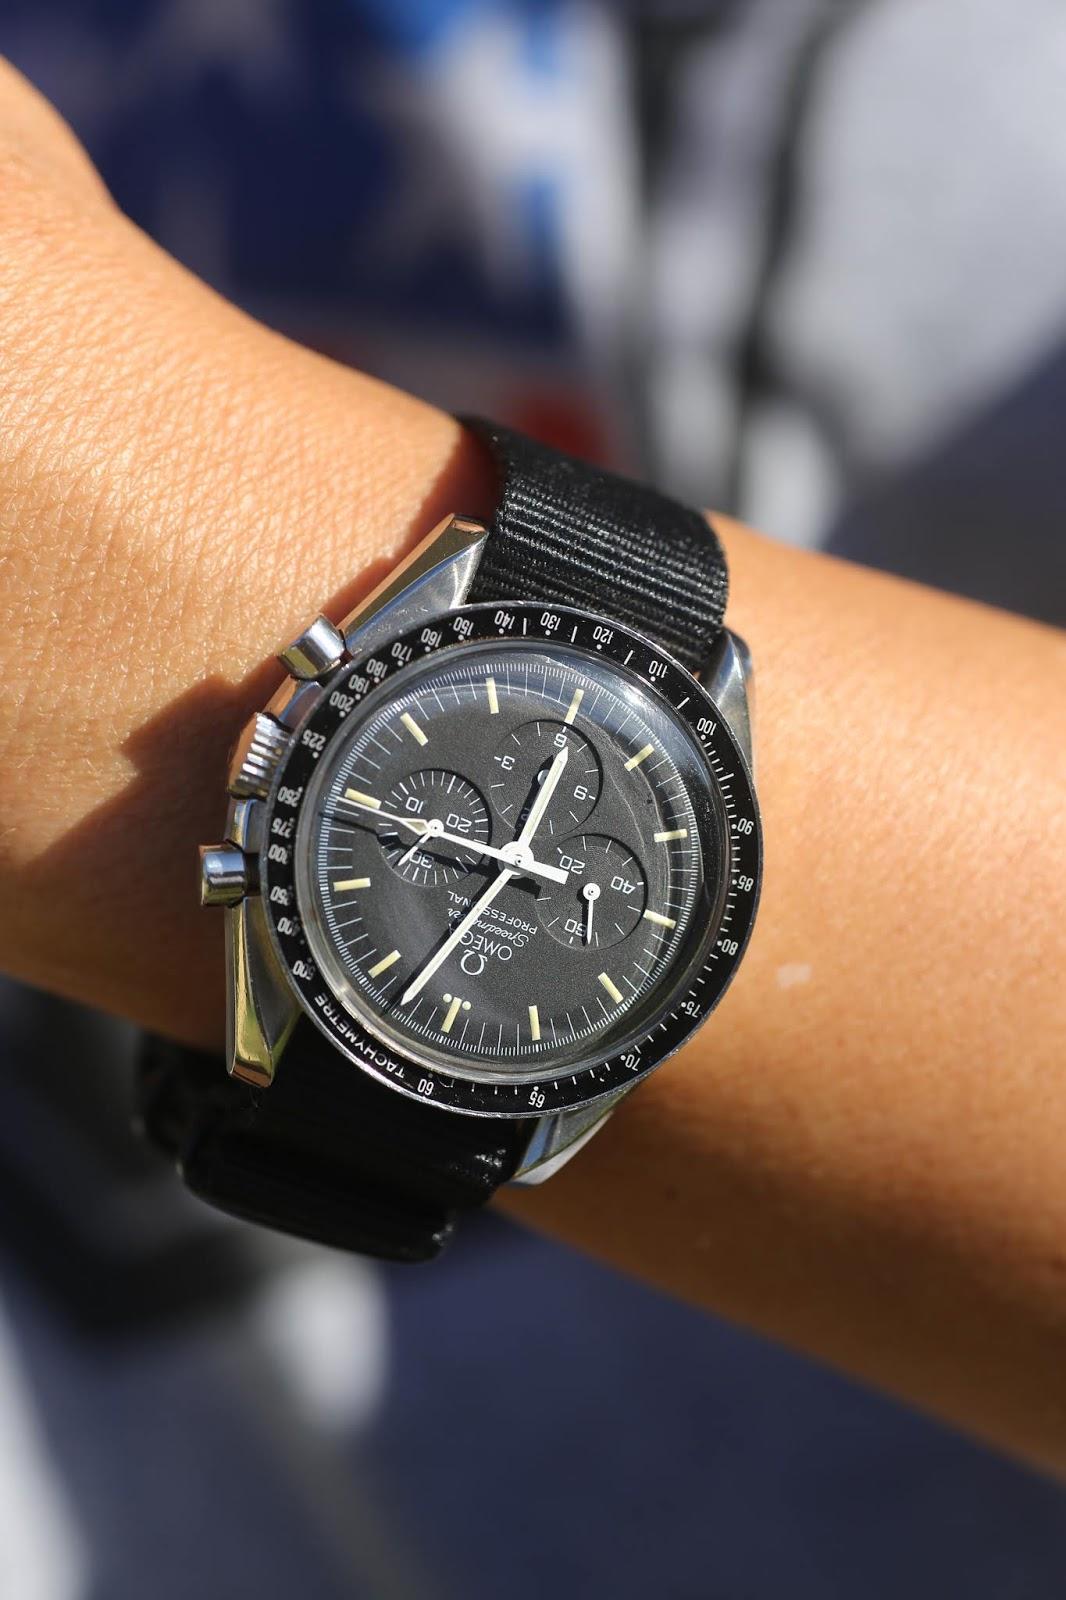 Omega Speedmaster 3590.50 Watch Vault Wristshot.JPG